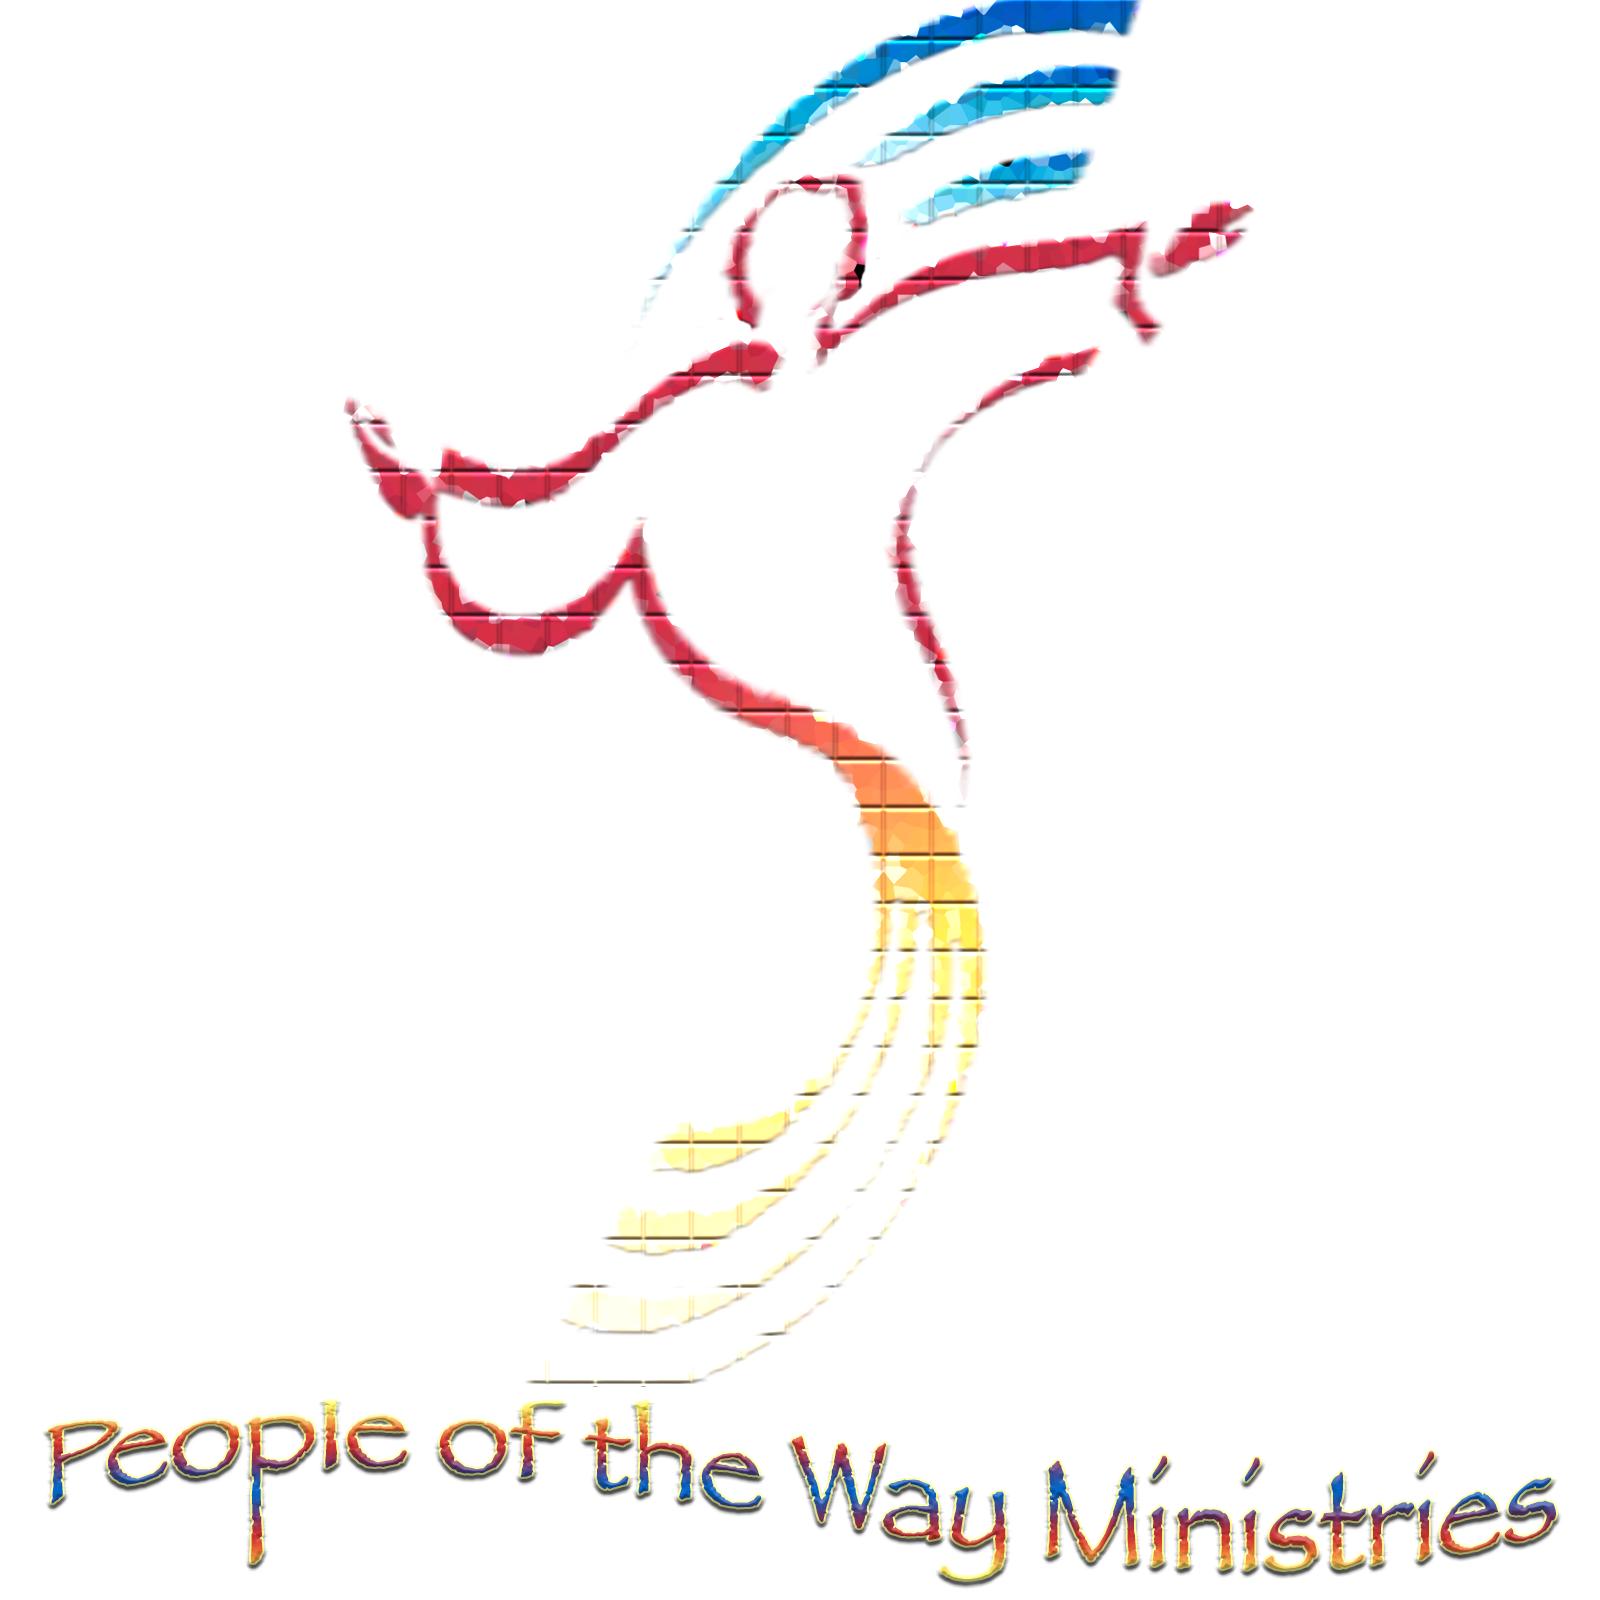 potwm logo.png